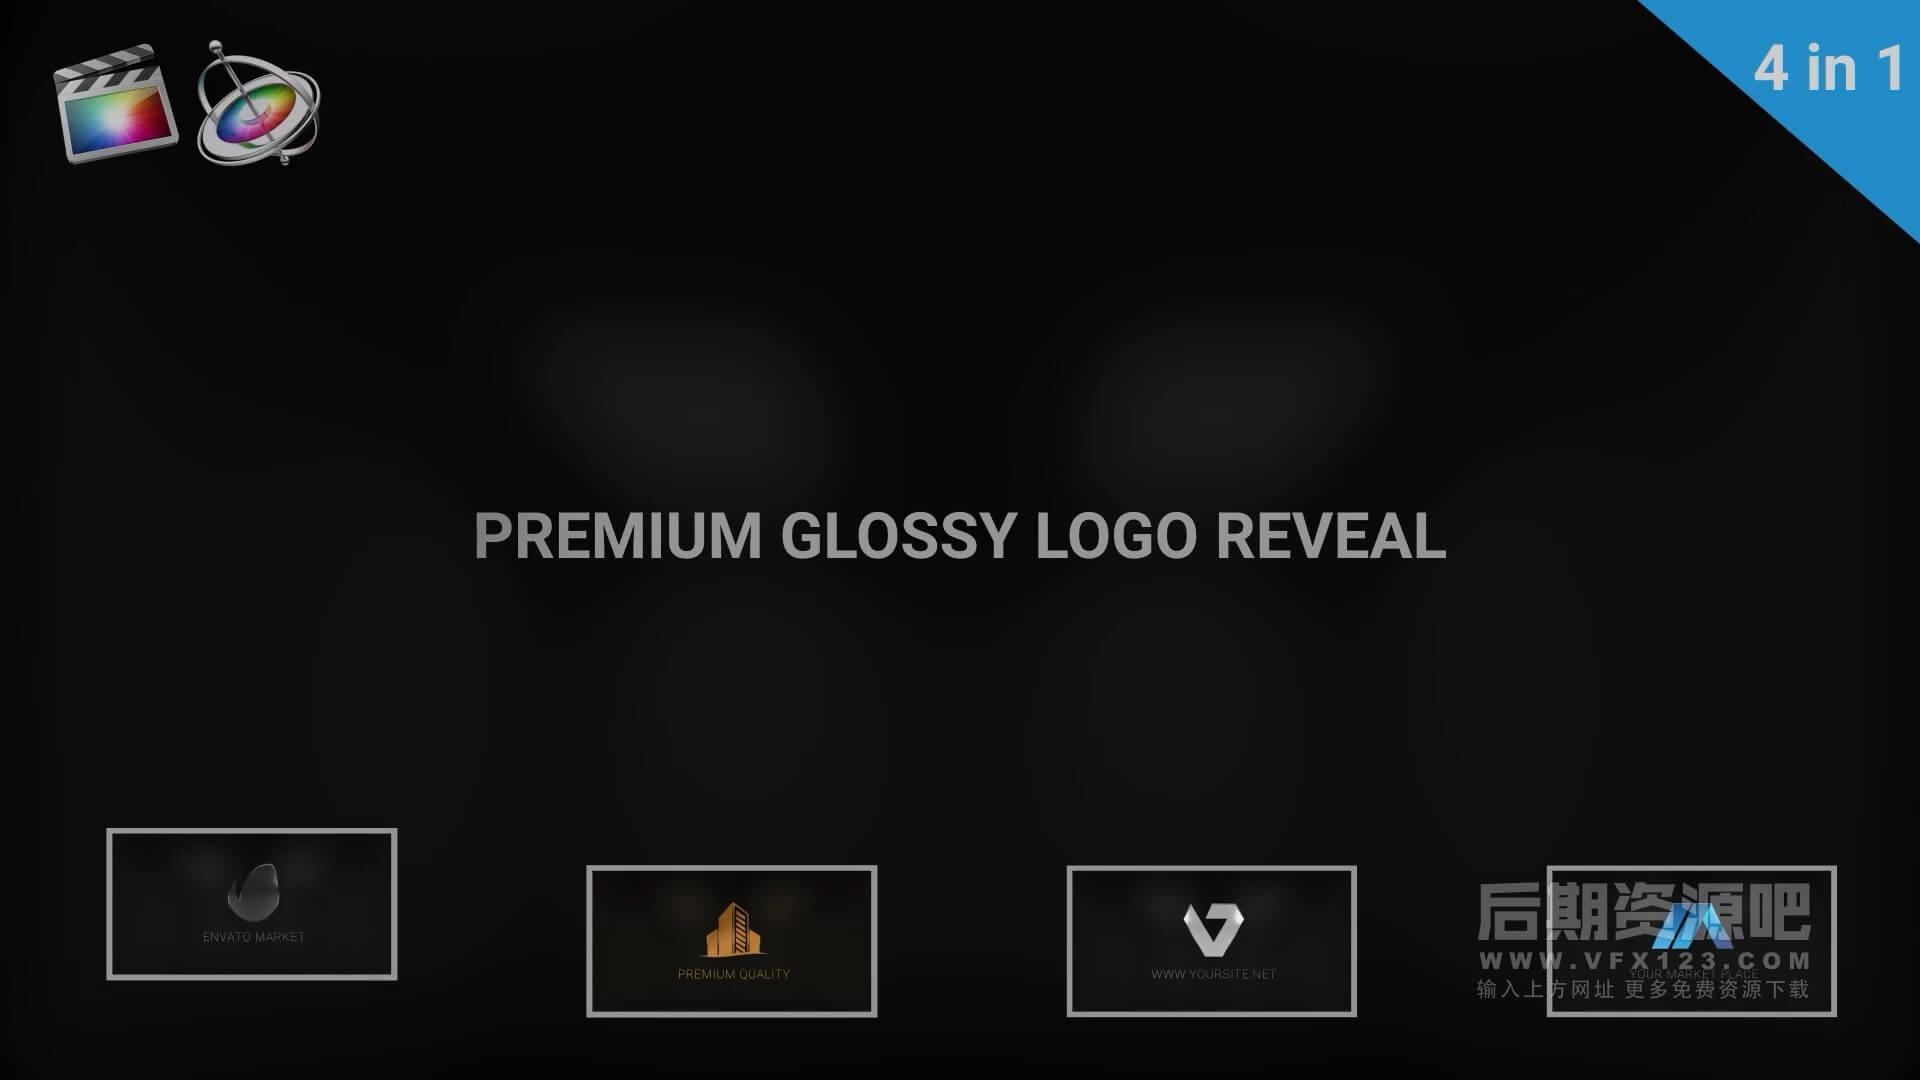 fcpx主题模板 3D金属光泽LOGO徽标展示片头 Premium Glossy Logo Reveal